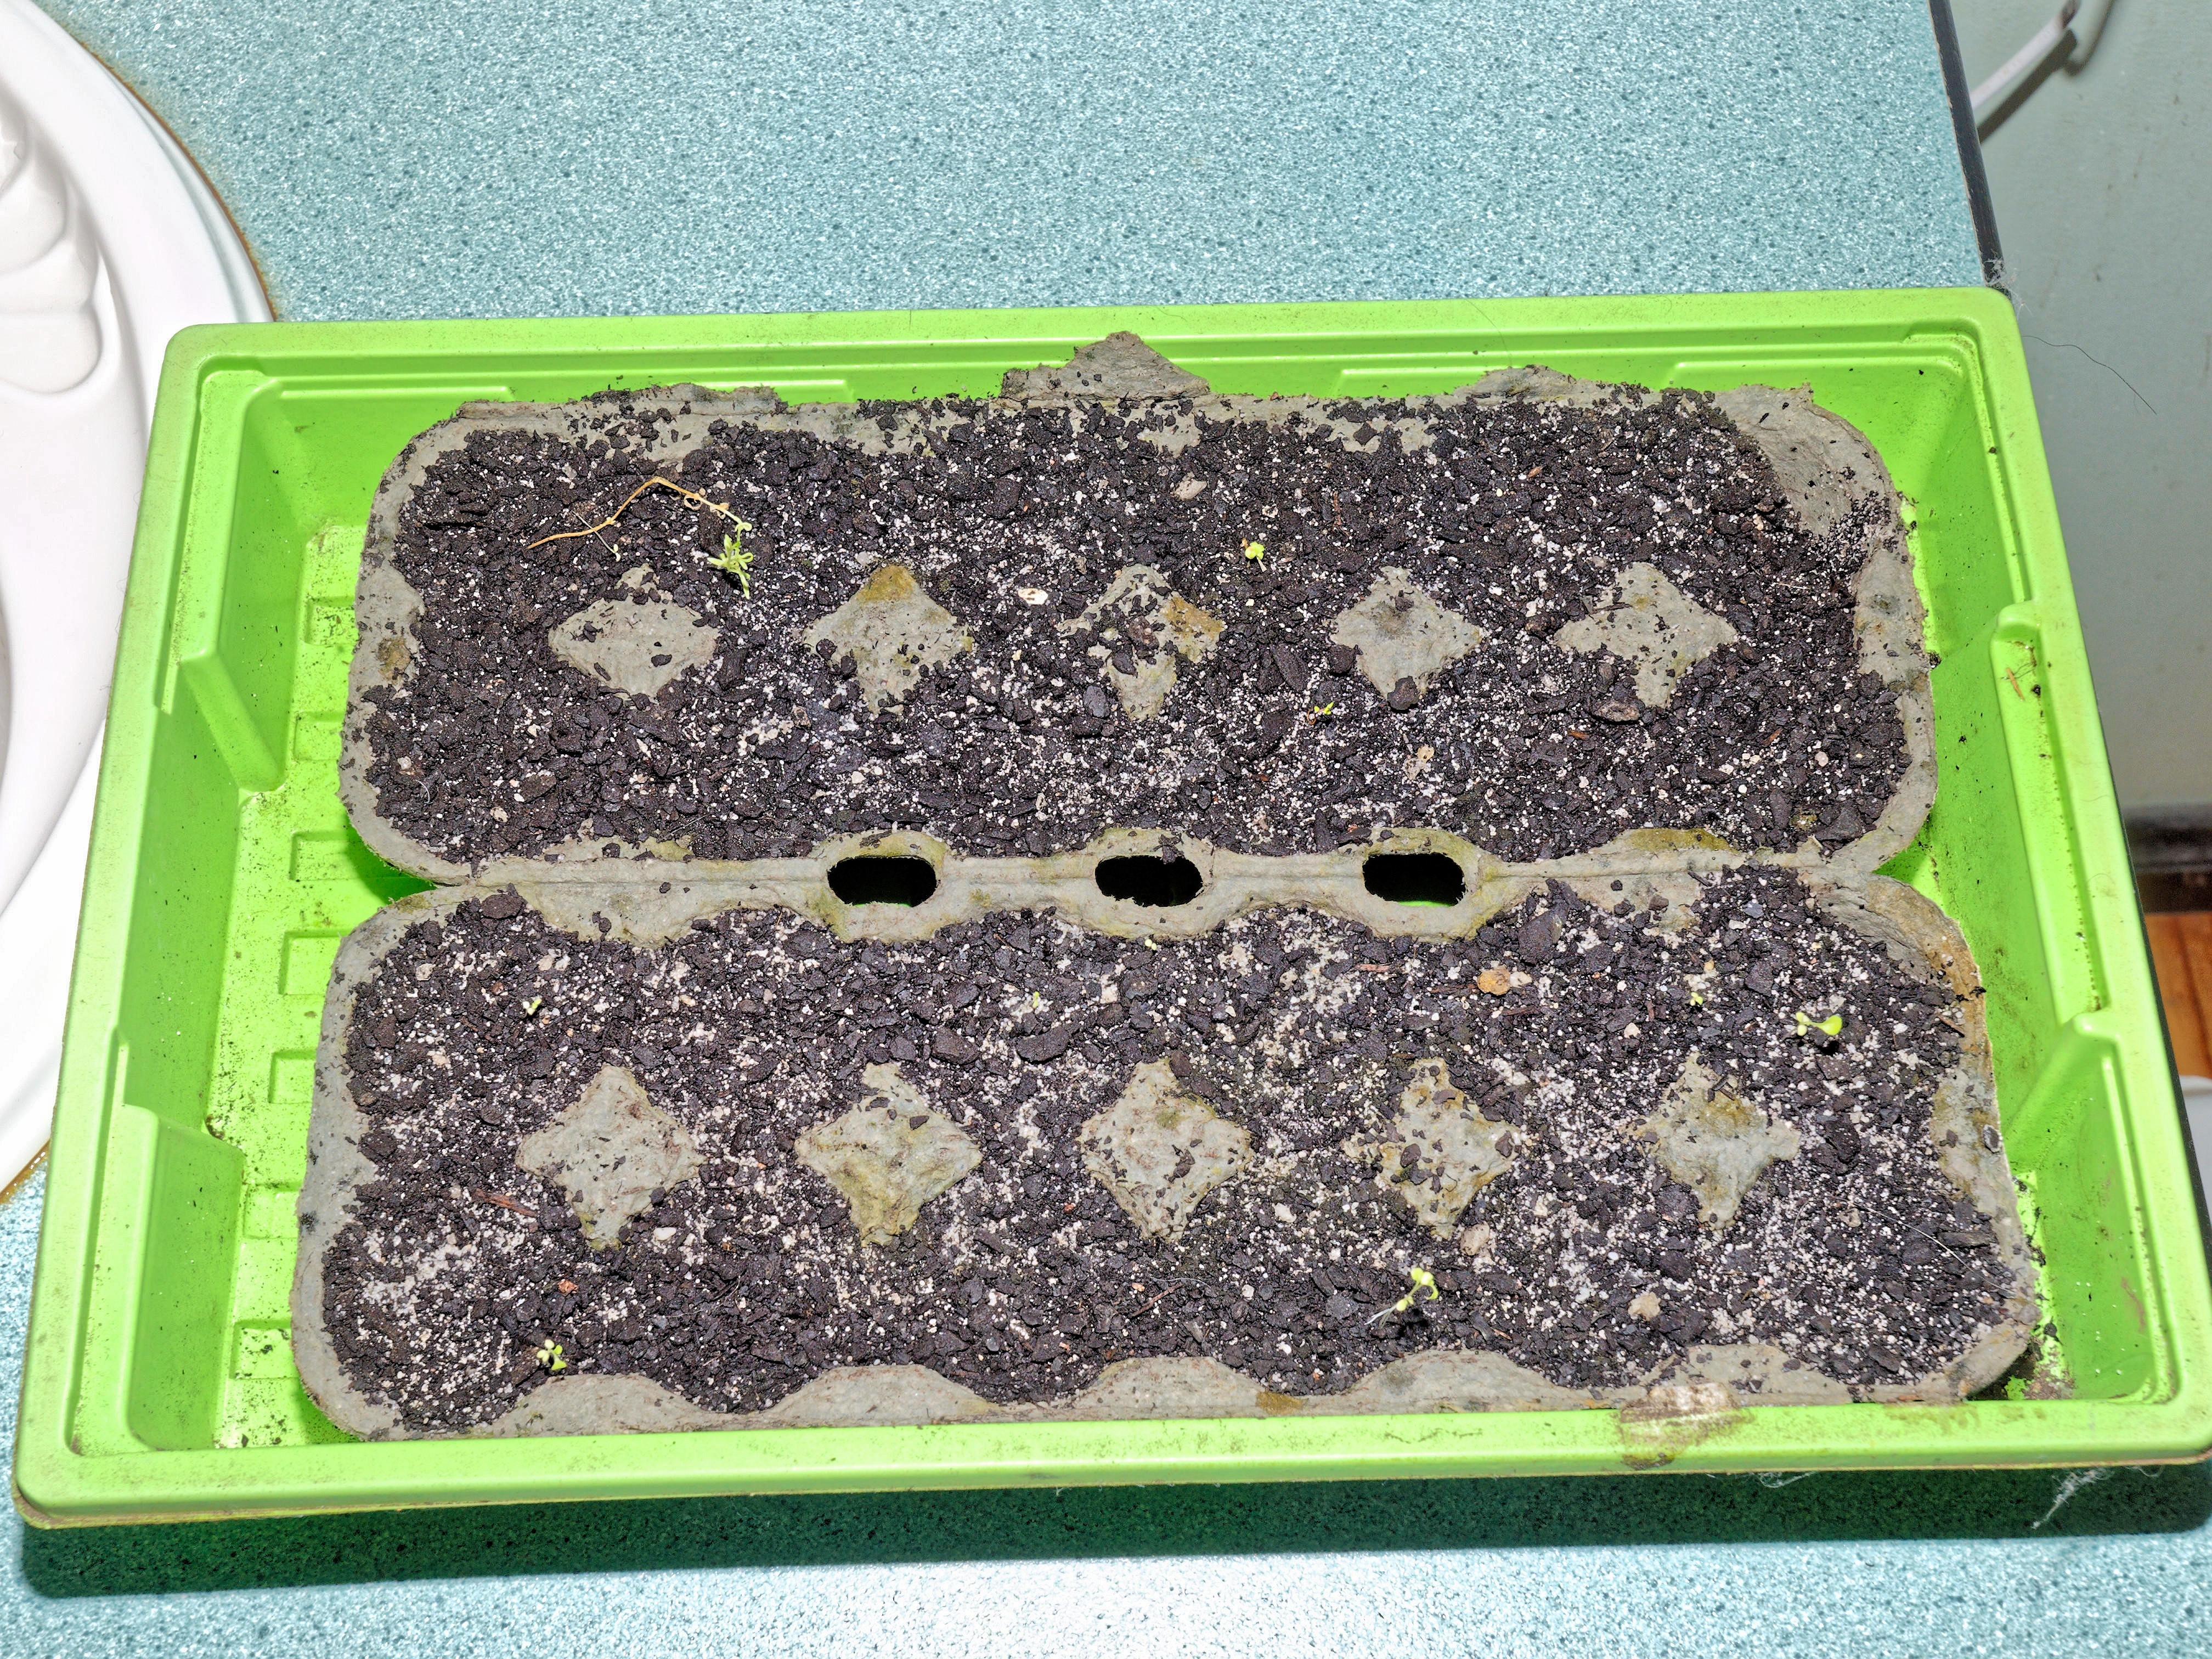 Seedlings-2.jpeg